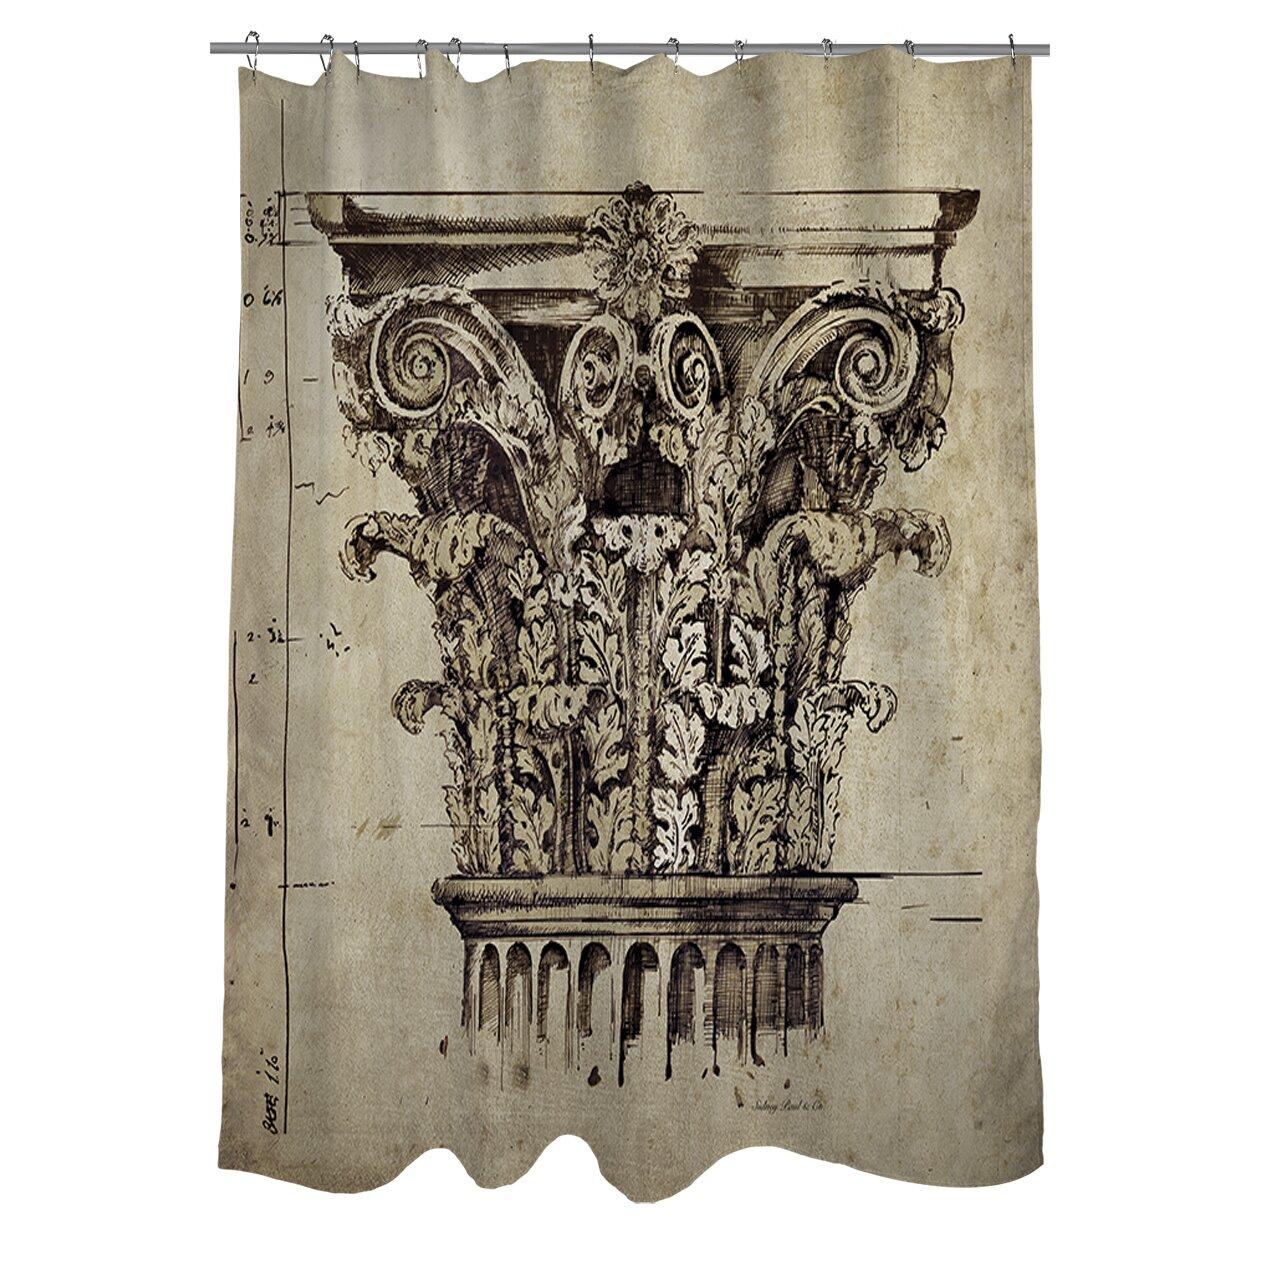 Manual woodworkers amp weavers column ii shower curtain amp reviews